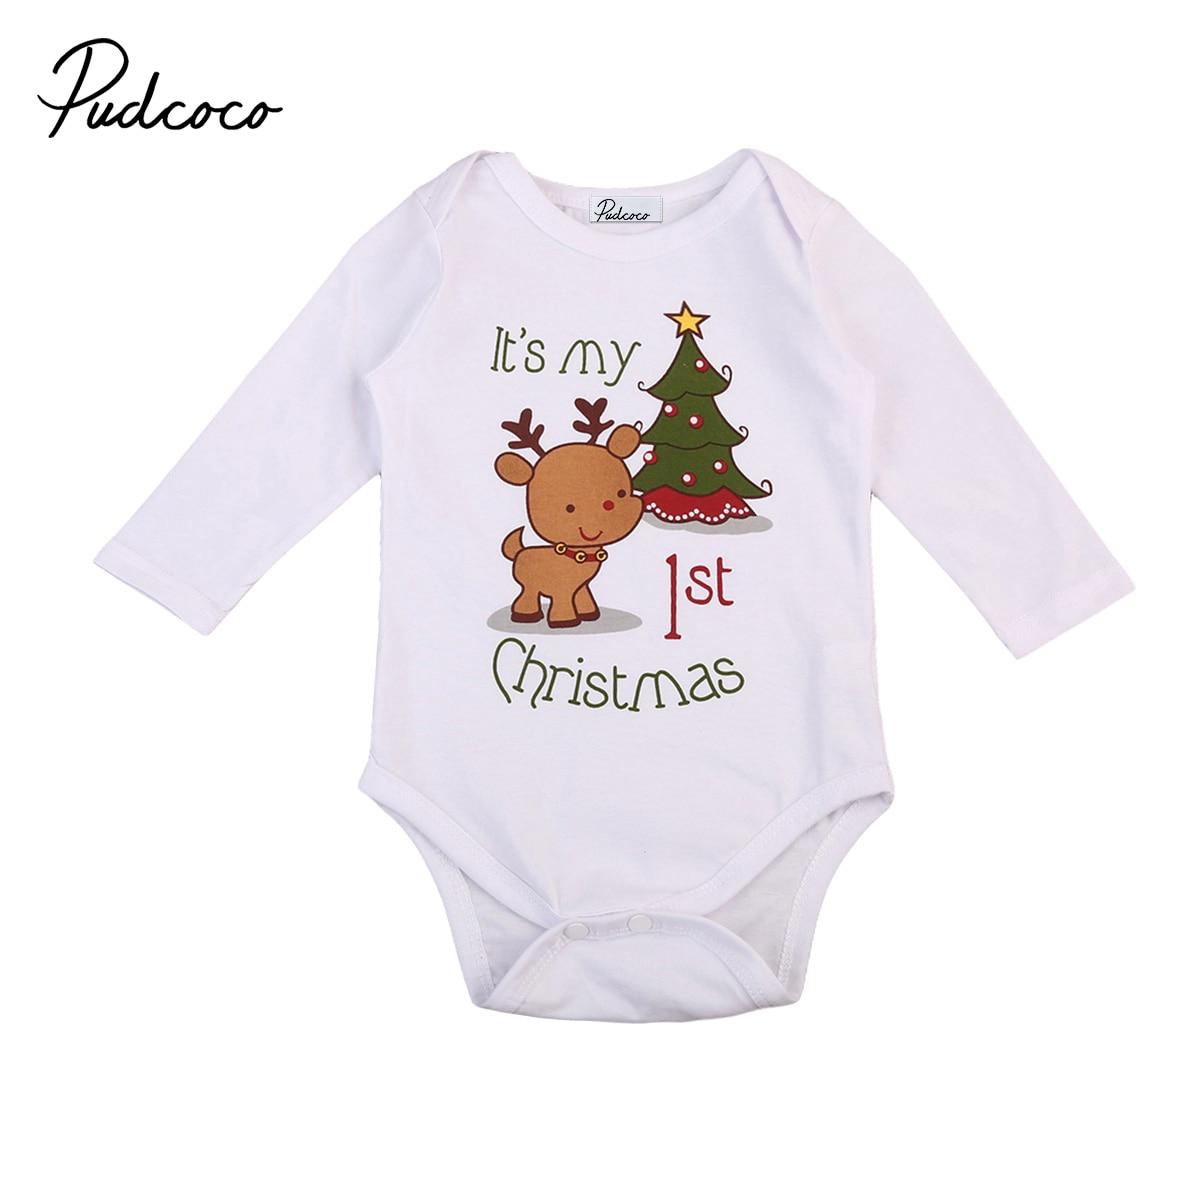 HTB1eng1Xy0TMKJjSZFNq6y 1FXai christmas baby romper newborn infant baby boys girls cartoon deer Christmas tree print long sleeves romper autumn baby clothing